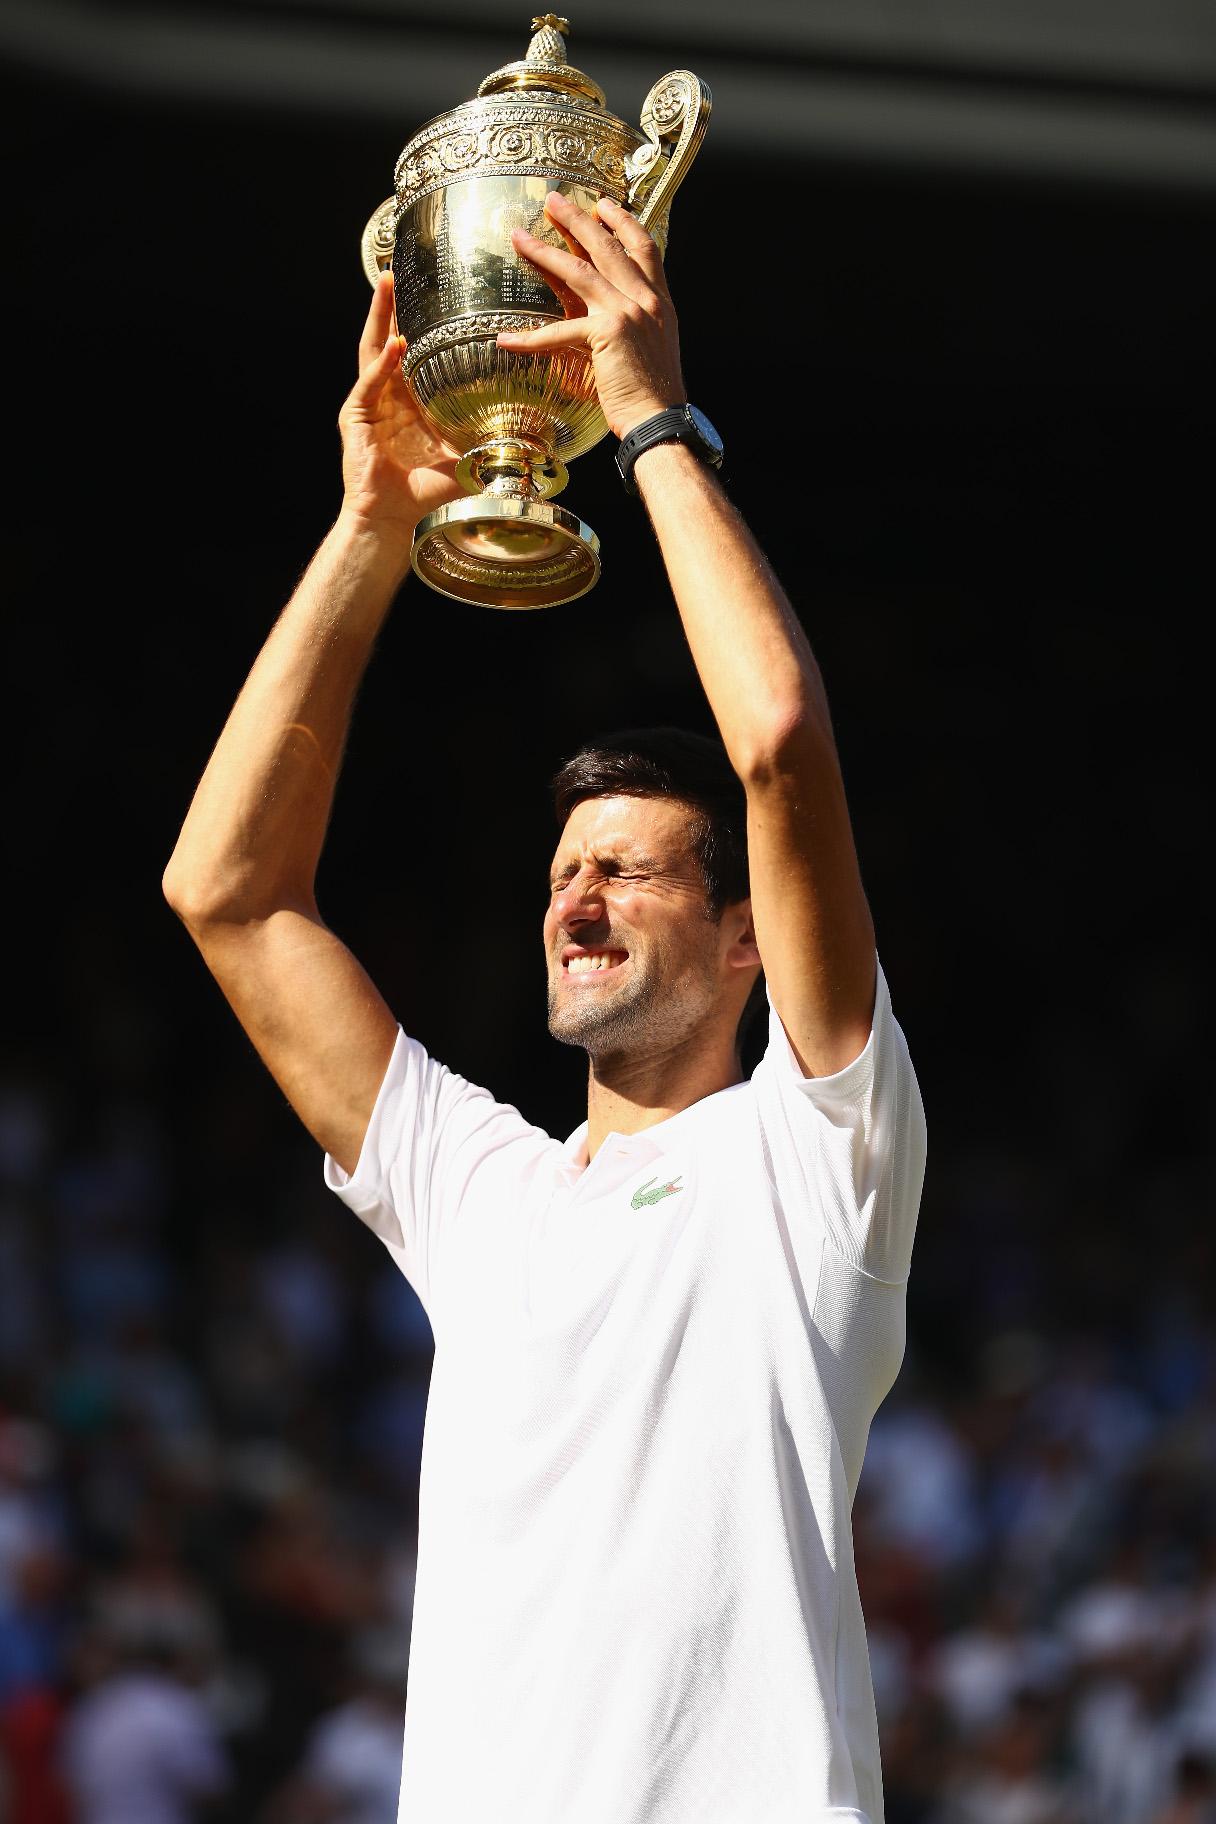 Novak drži trofej